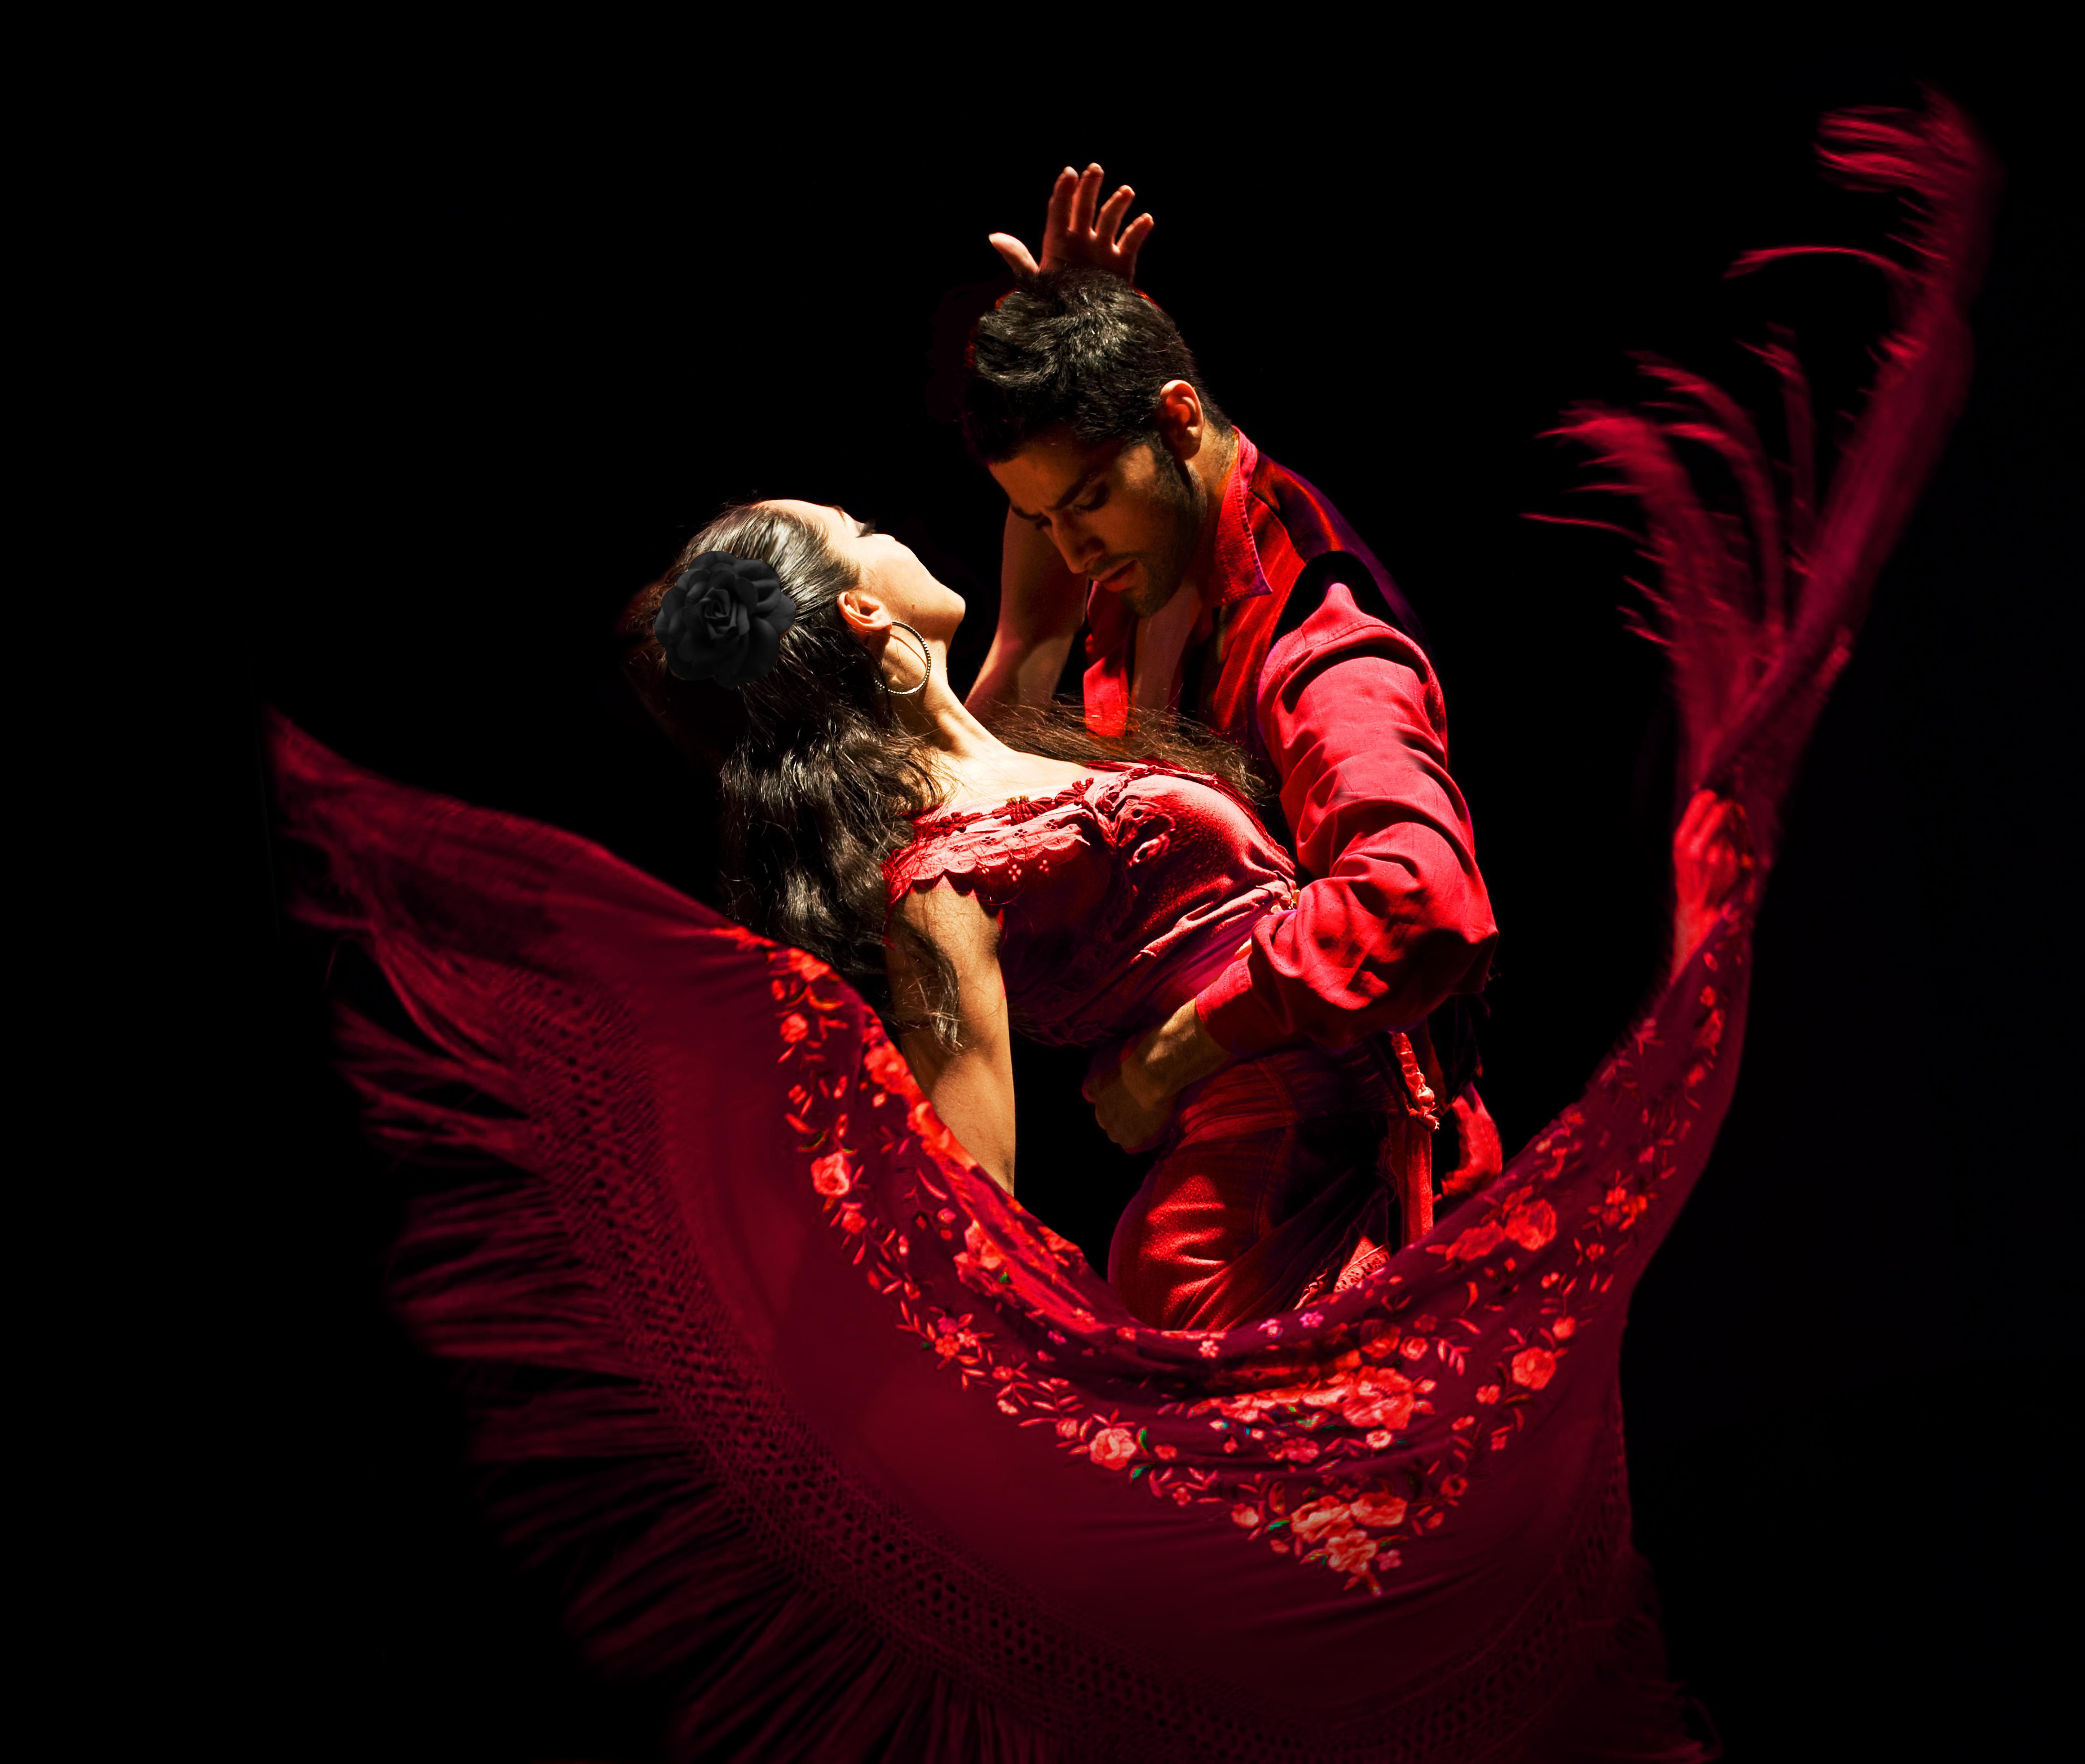 На фестивале «Kristupo Kal?dos» - феерический балет фламенко